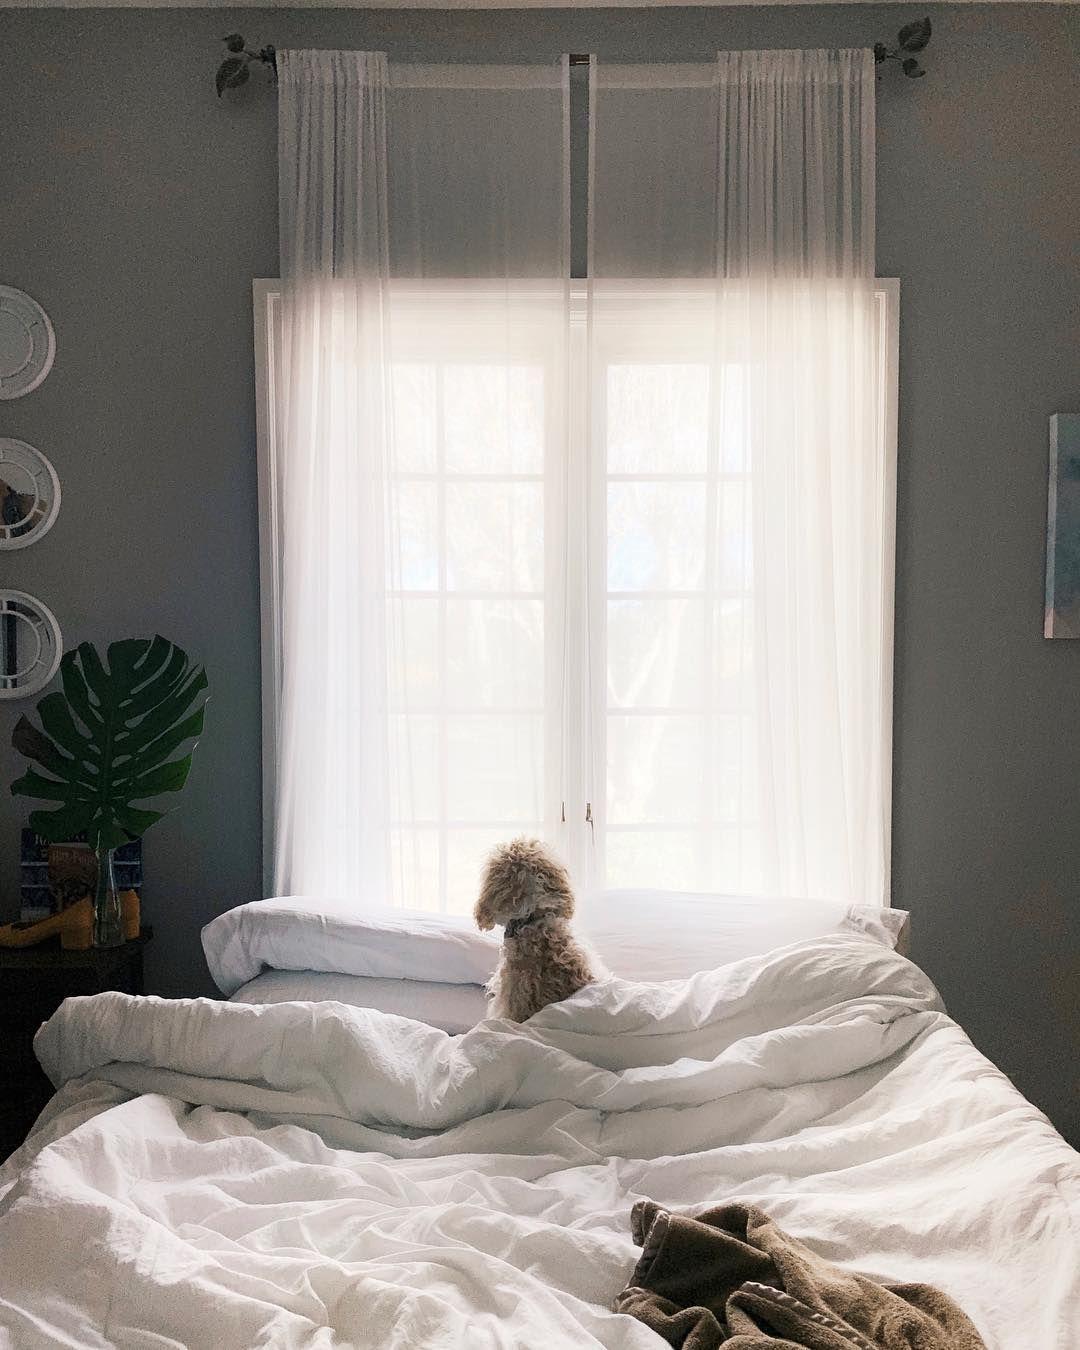 Linen Venice Set White Linen Bedding Bed Linens Luxury Bed